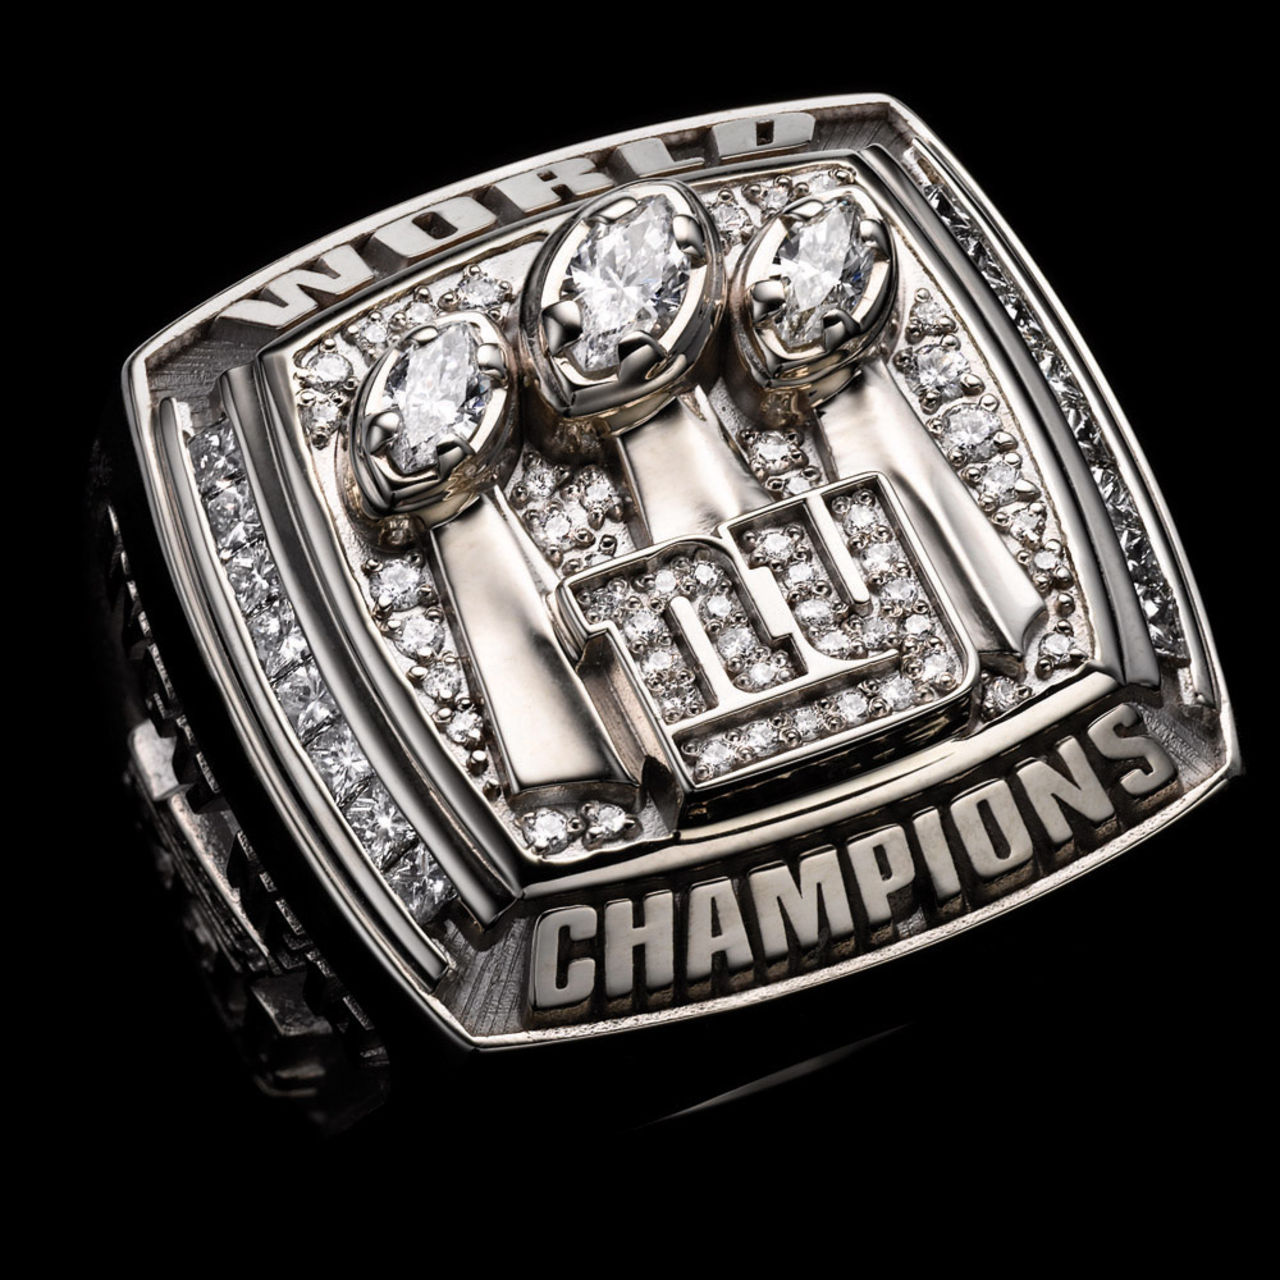 New York Giants 2008 champions ring